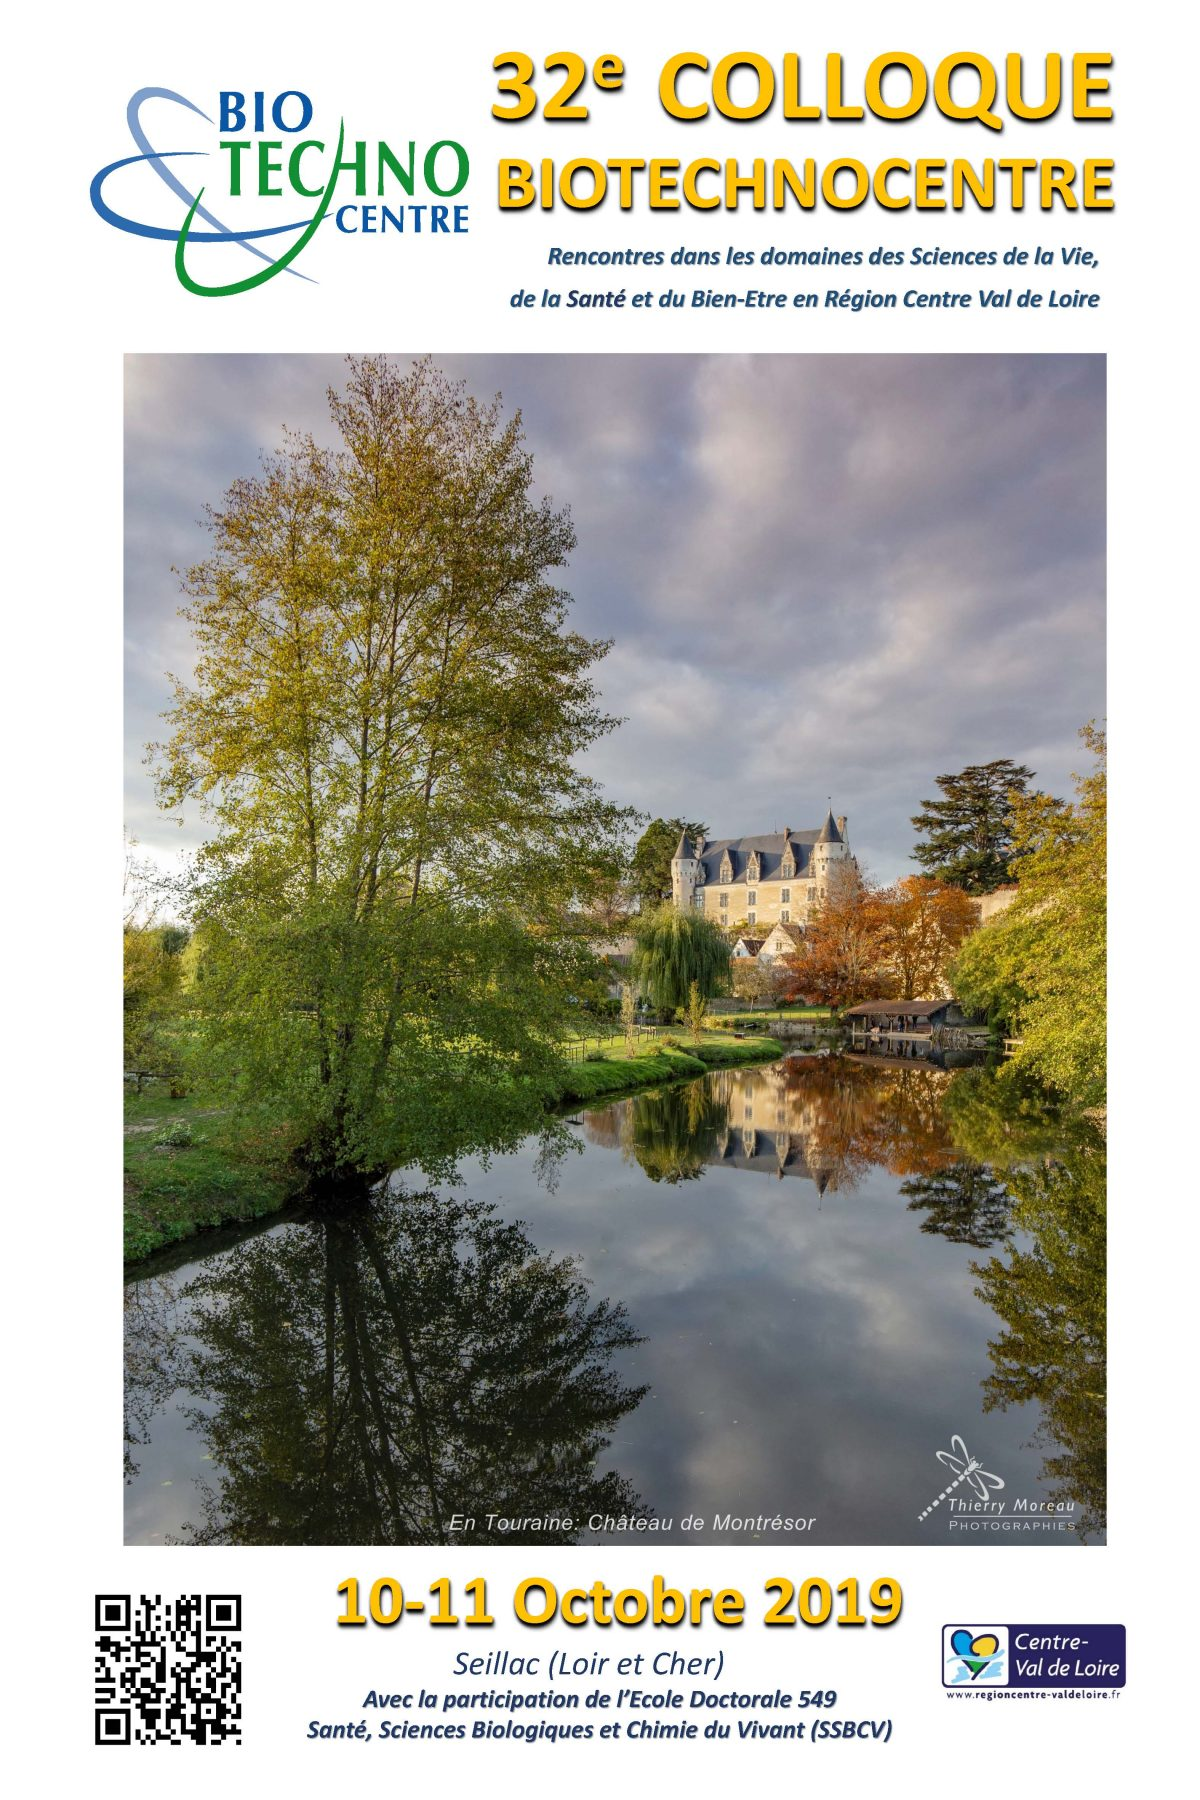 32e colloque Biotechnocentre – 10 et 11 octobre 2019 – Seillac